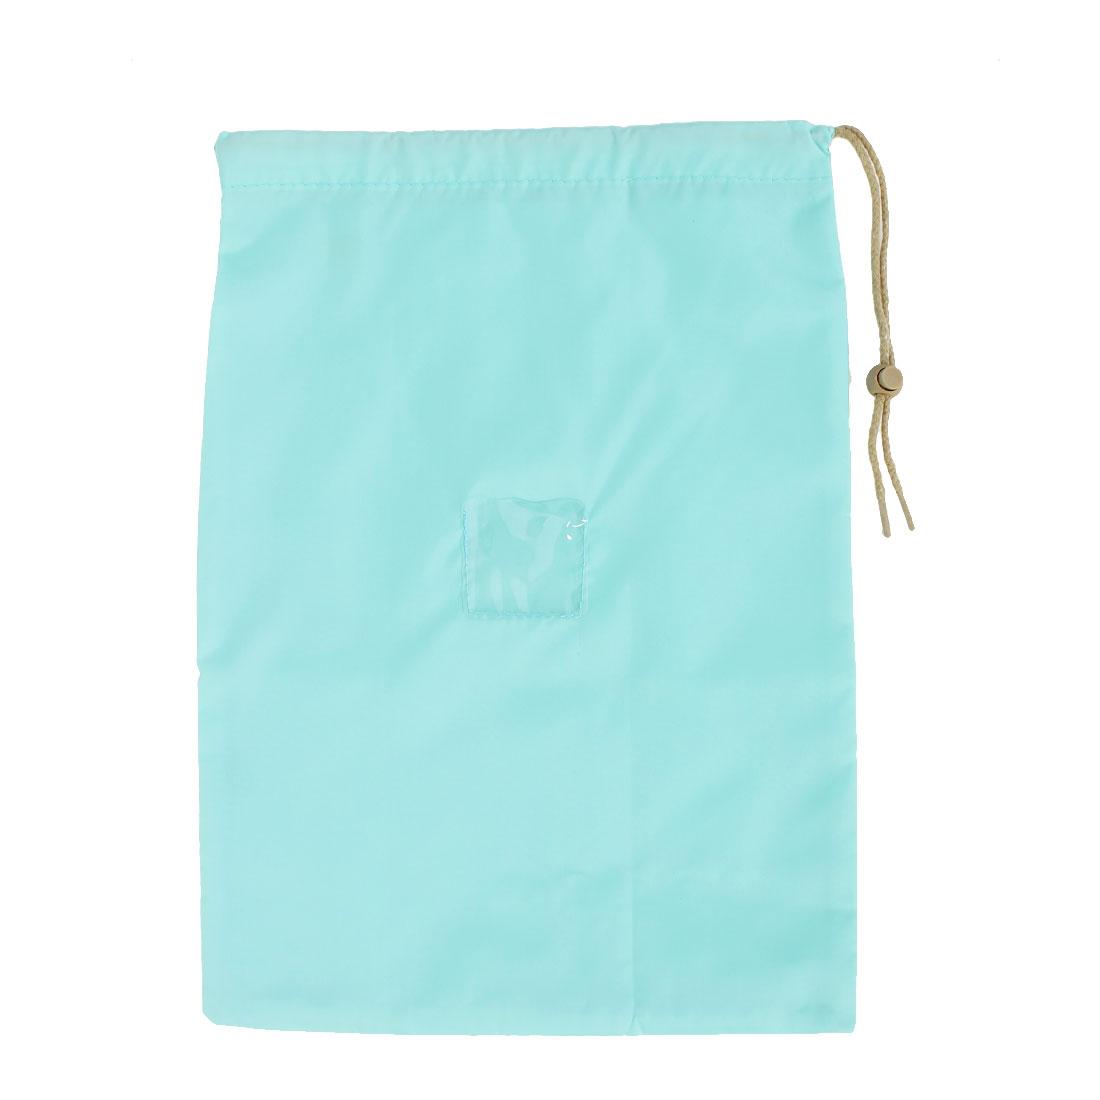 Travel String Clothes Shoes Storage Drawstring Bag 37 x 26cm Light Green